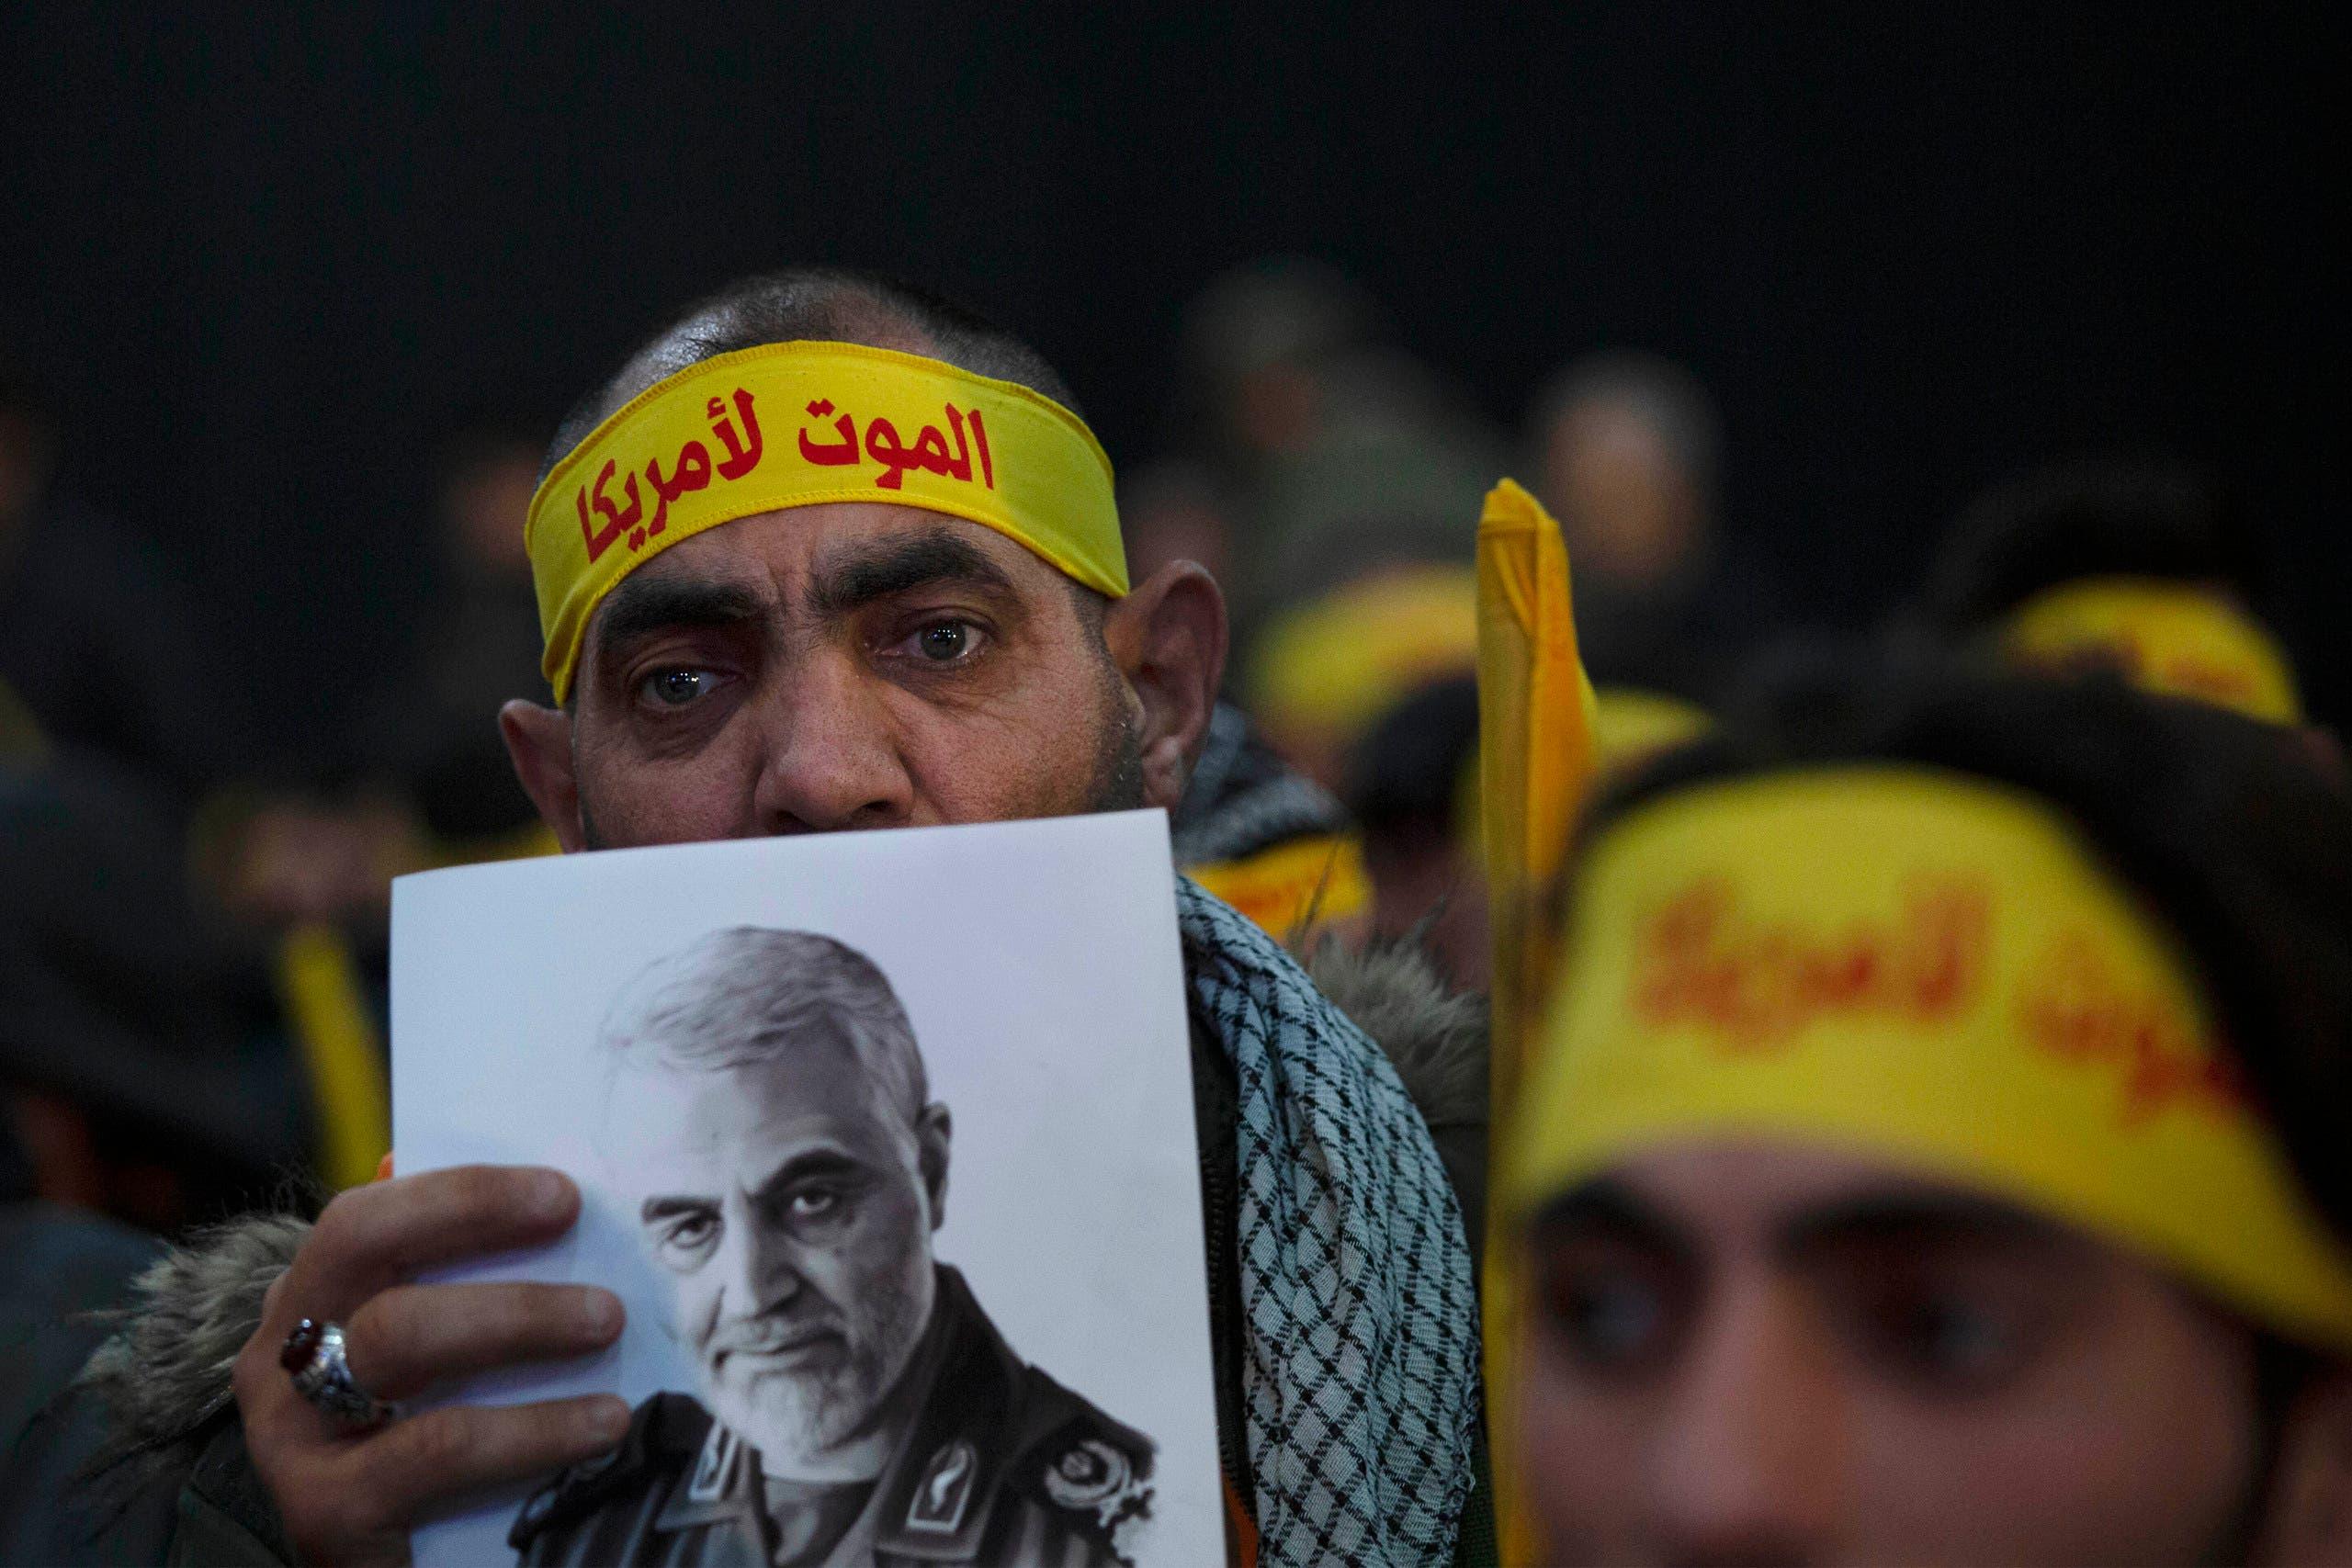 Iraq, Kurdish politicians denounce Hezbollah move to partner with pro-Iran militias 3553a2b9-d8b8-4f76-b8b0-43b23e4a5d66